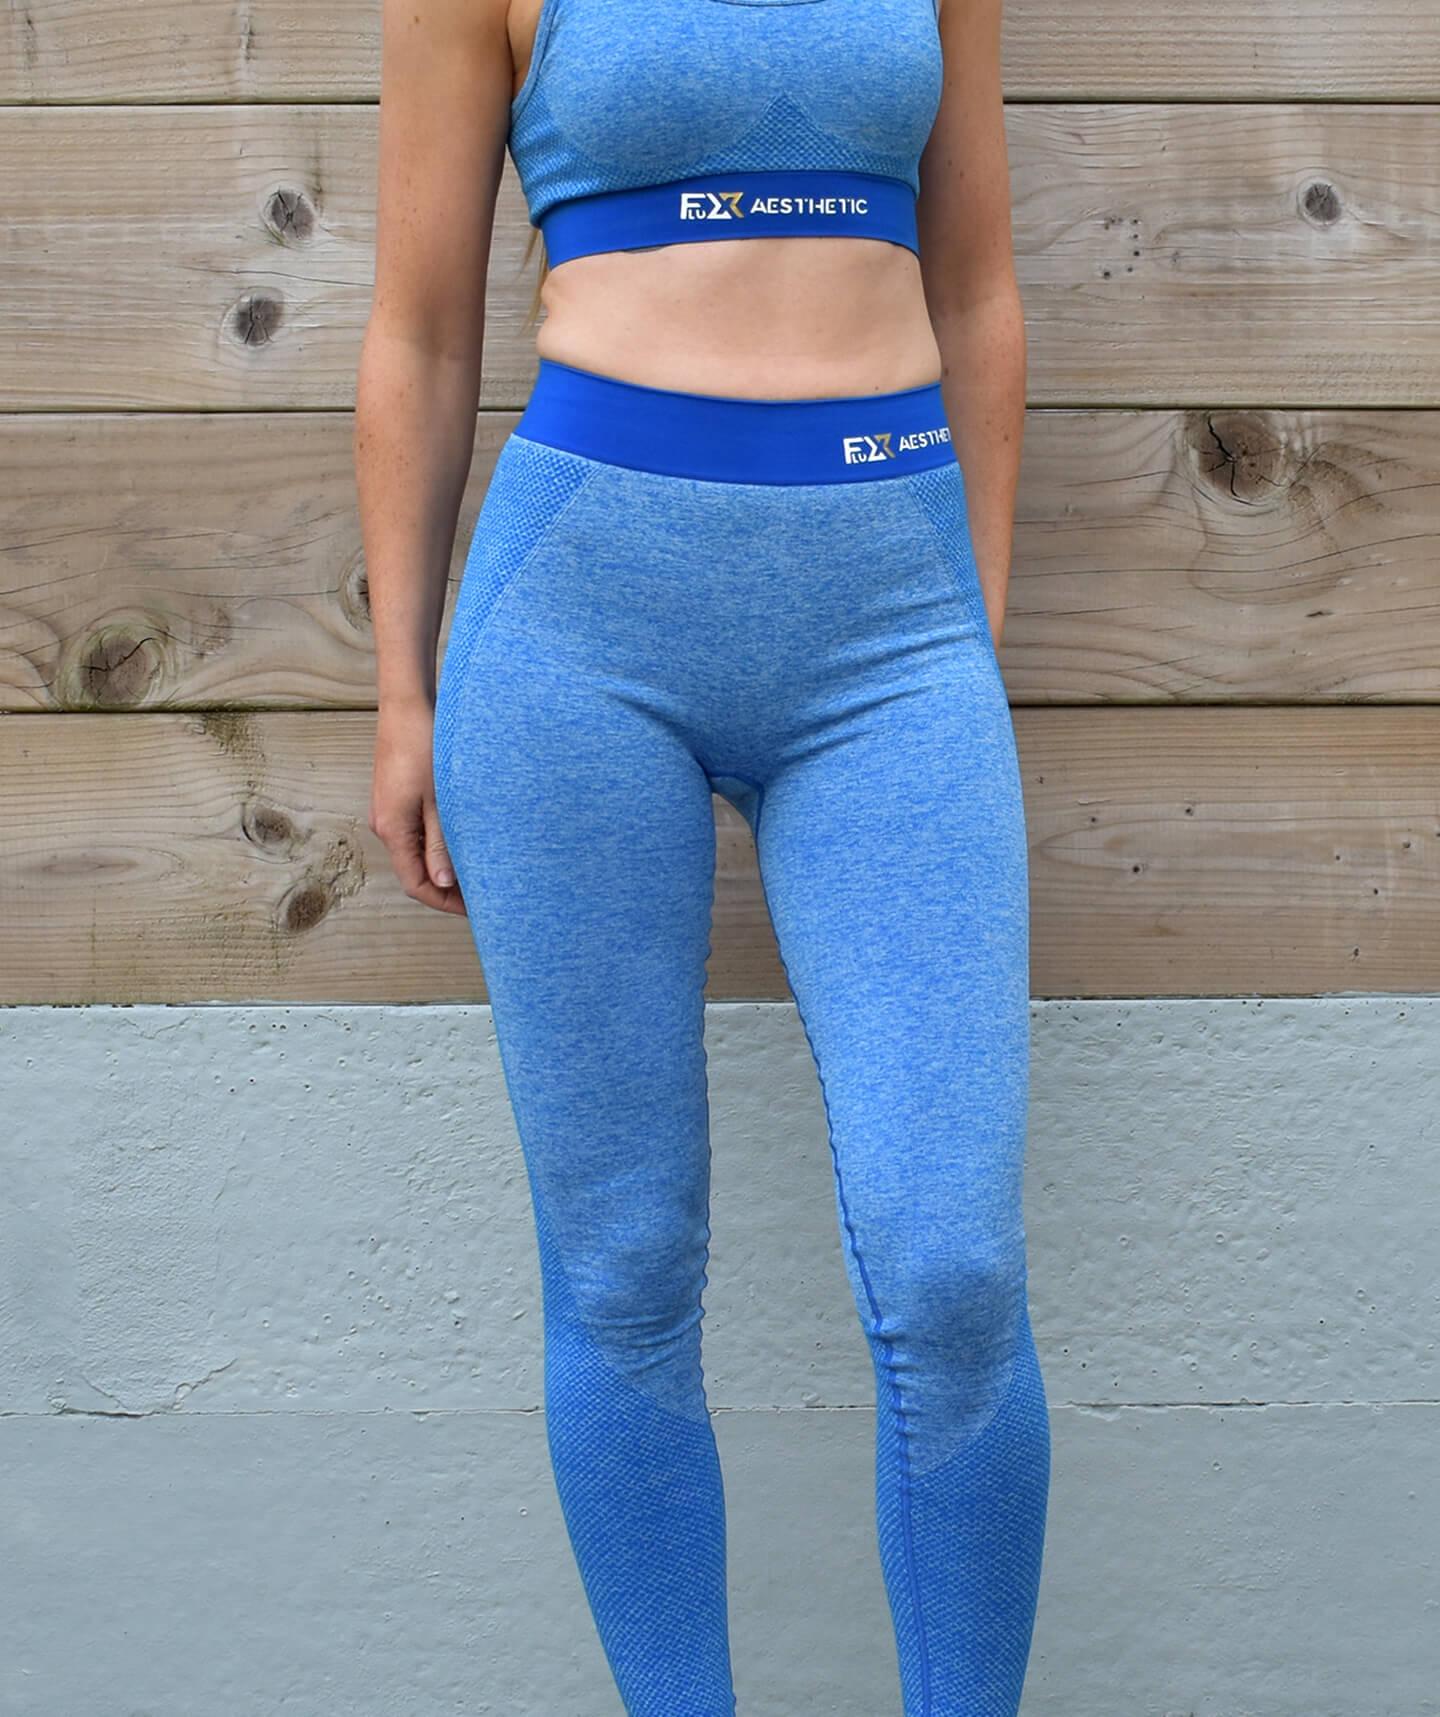 35ef2d96e64d91 3d Seamless Sports Leggings | Flux Athletic